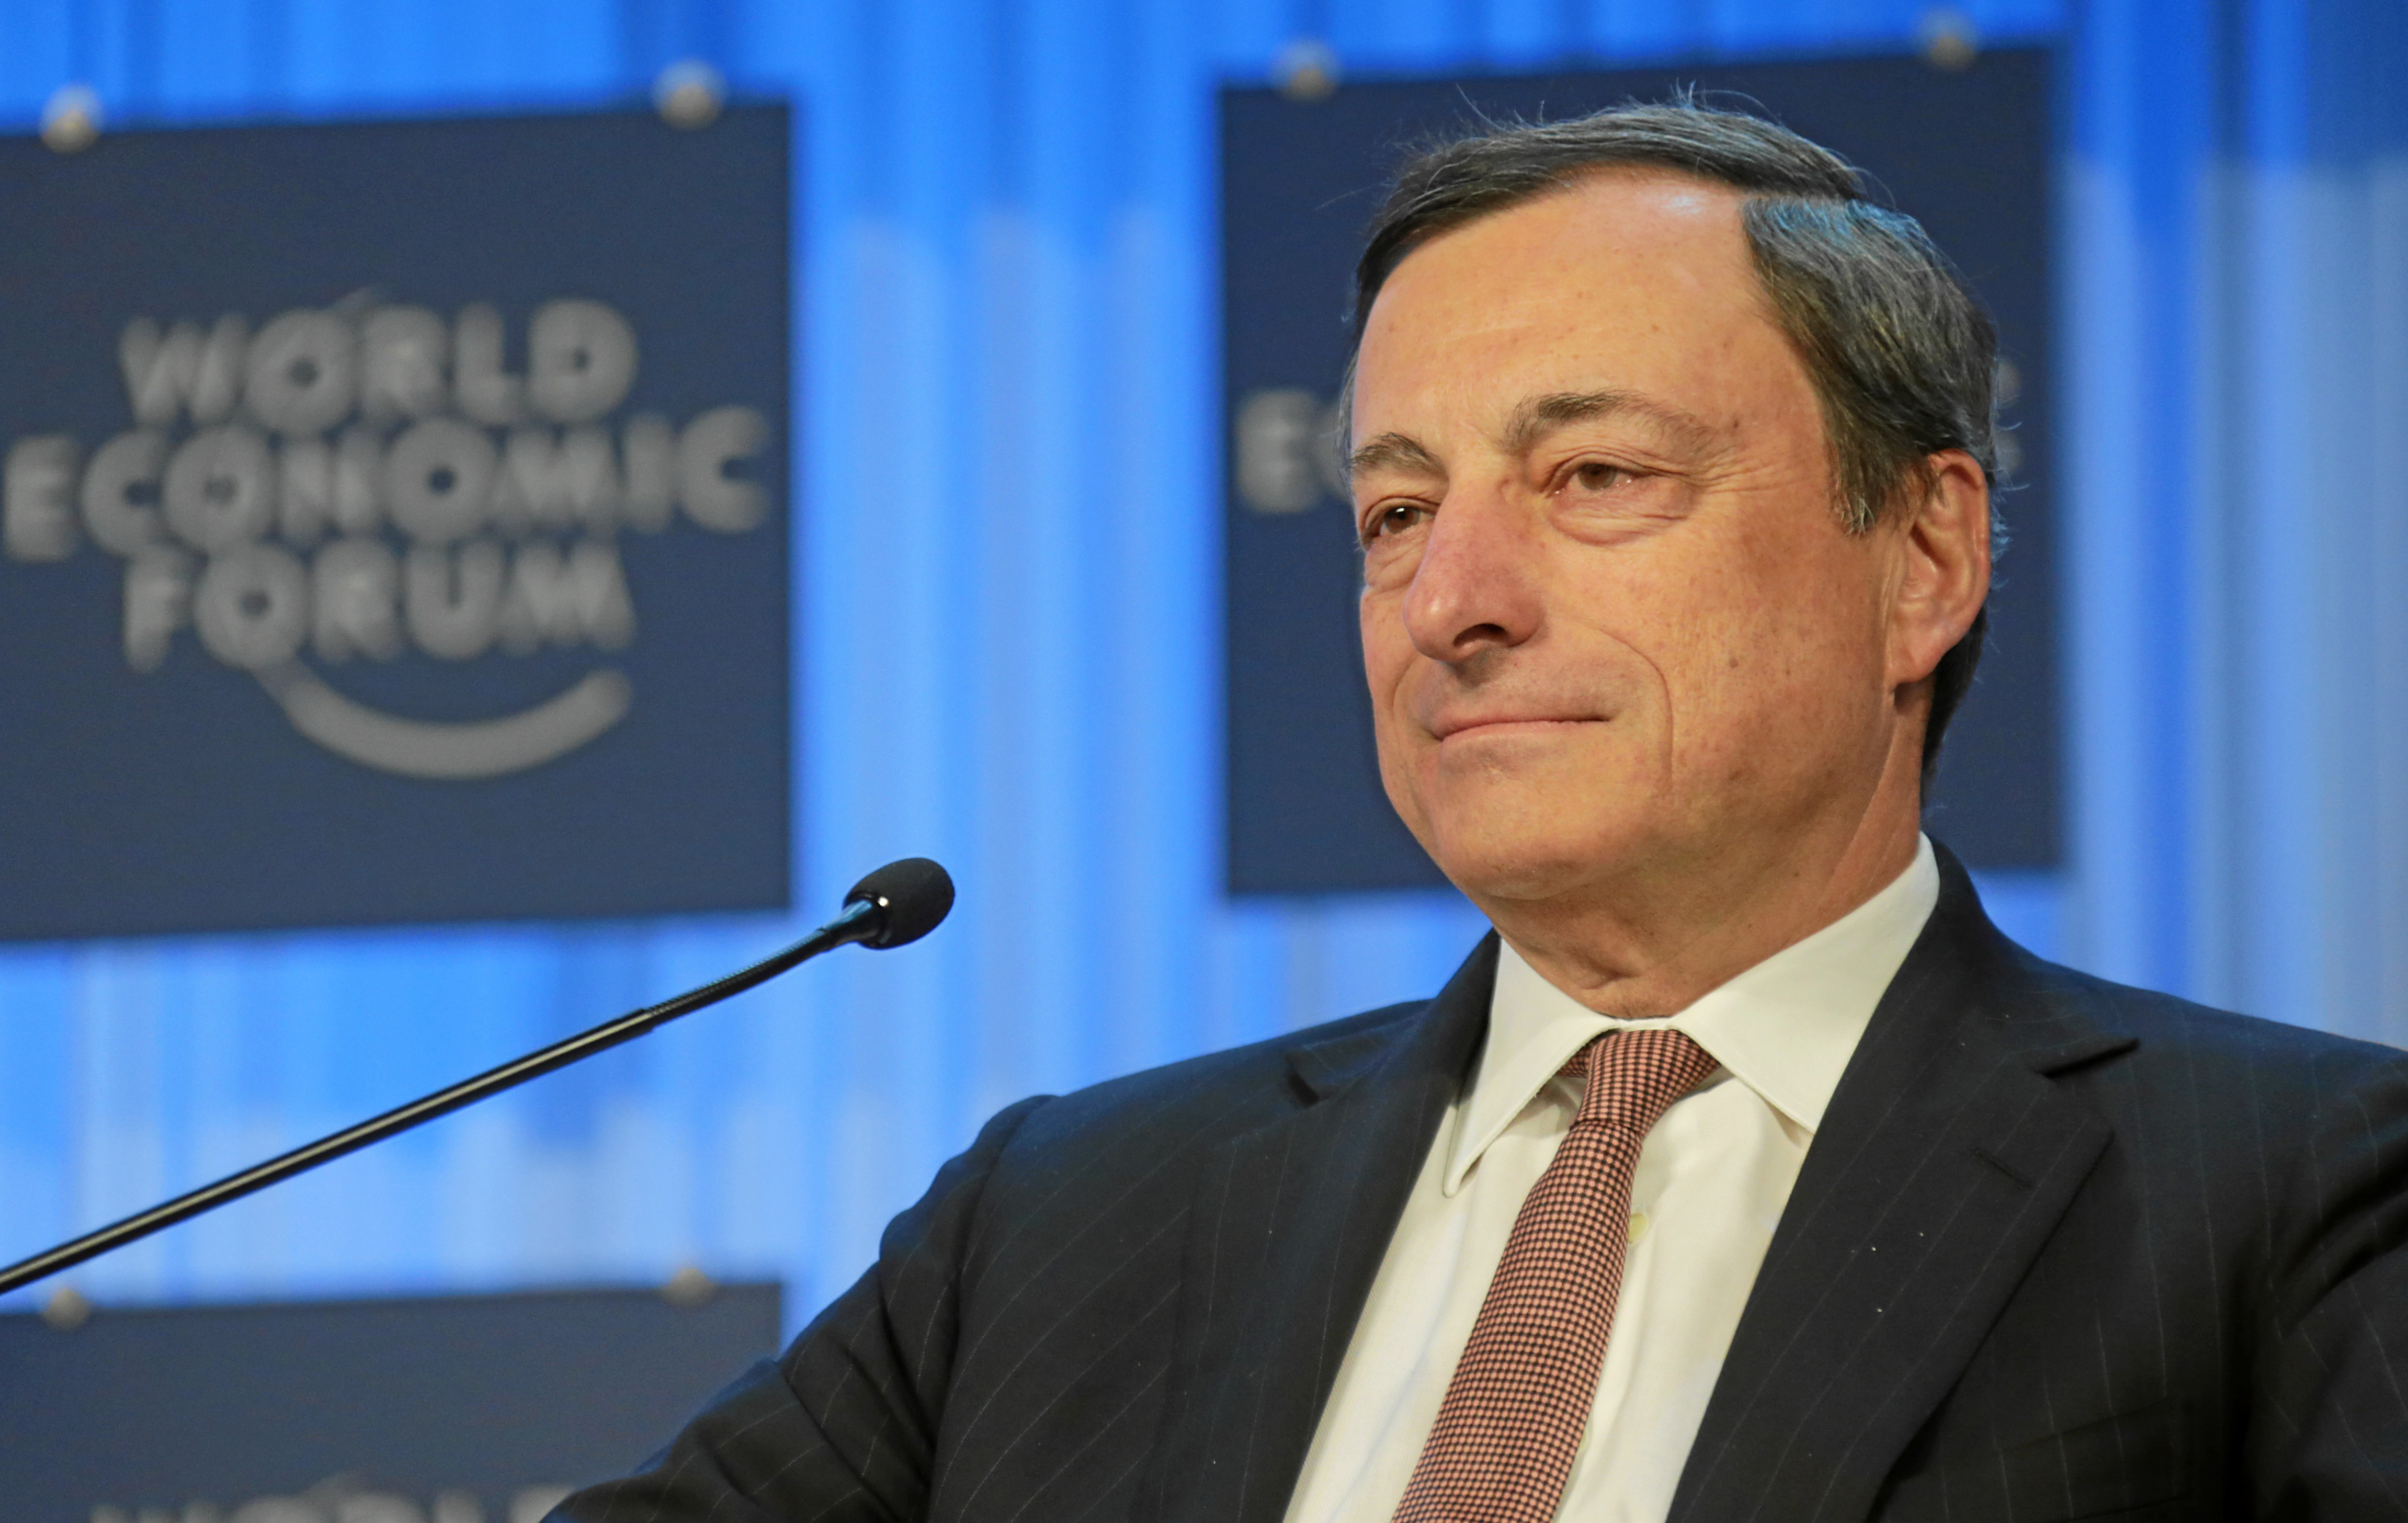 Mario_draghi_world_economic_forum_2013-